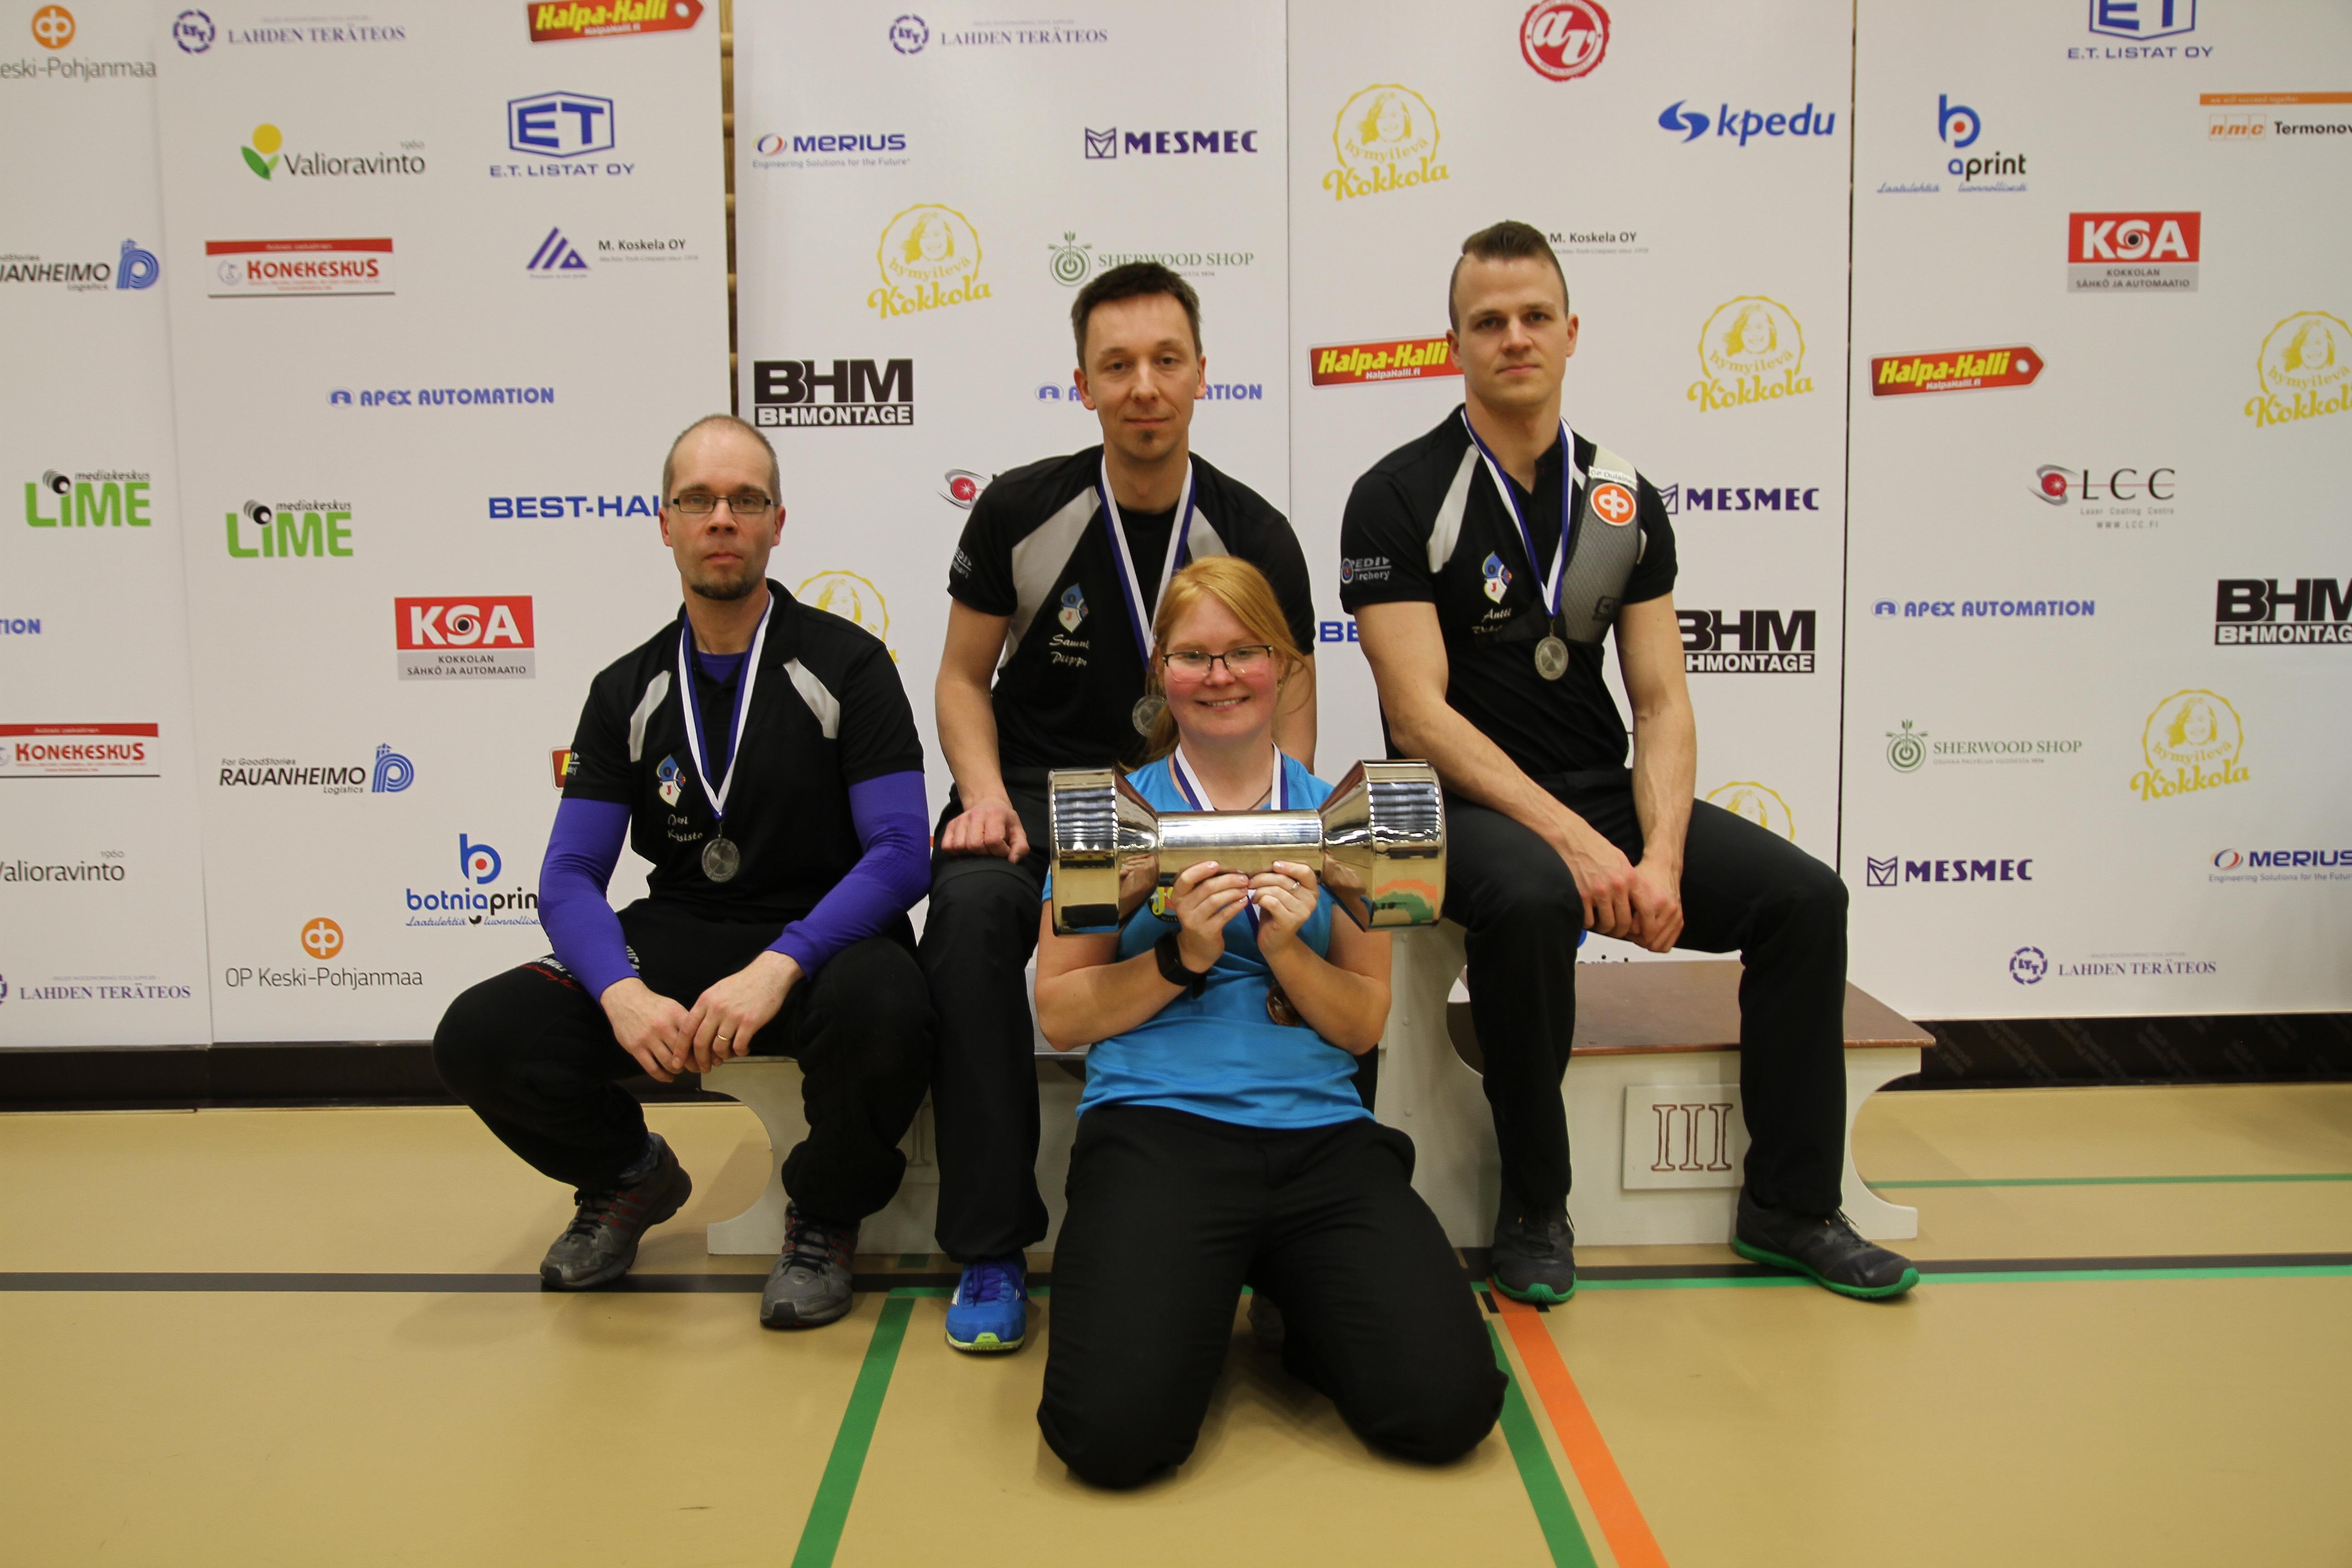 Kokkola SM-kilpailu 4-5.3.2017